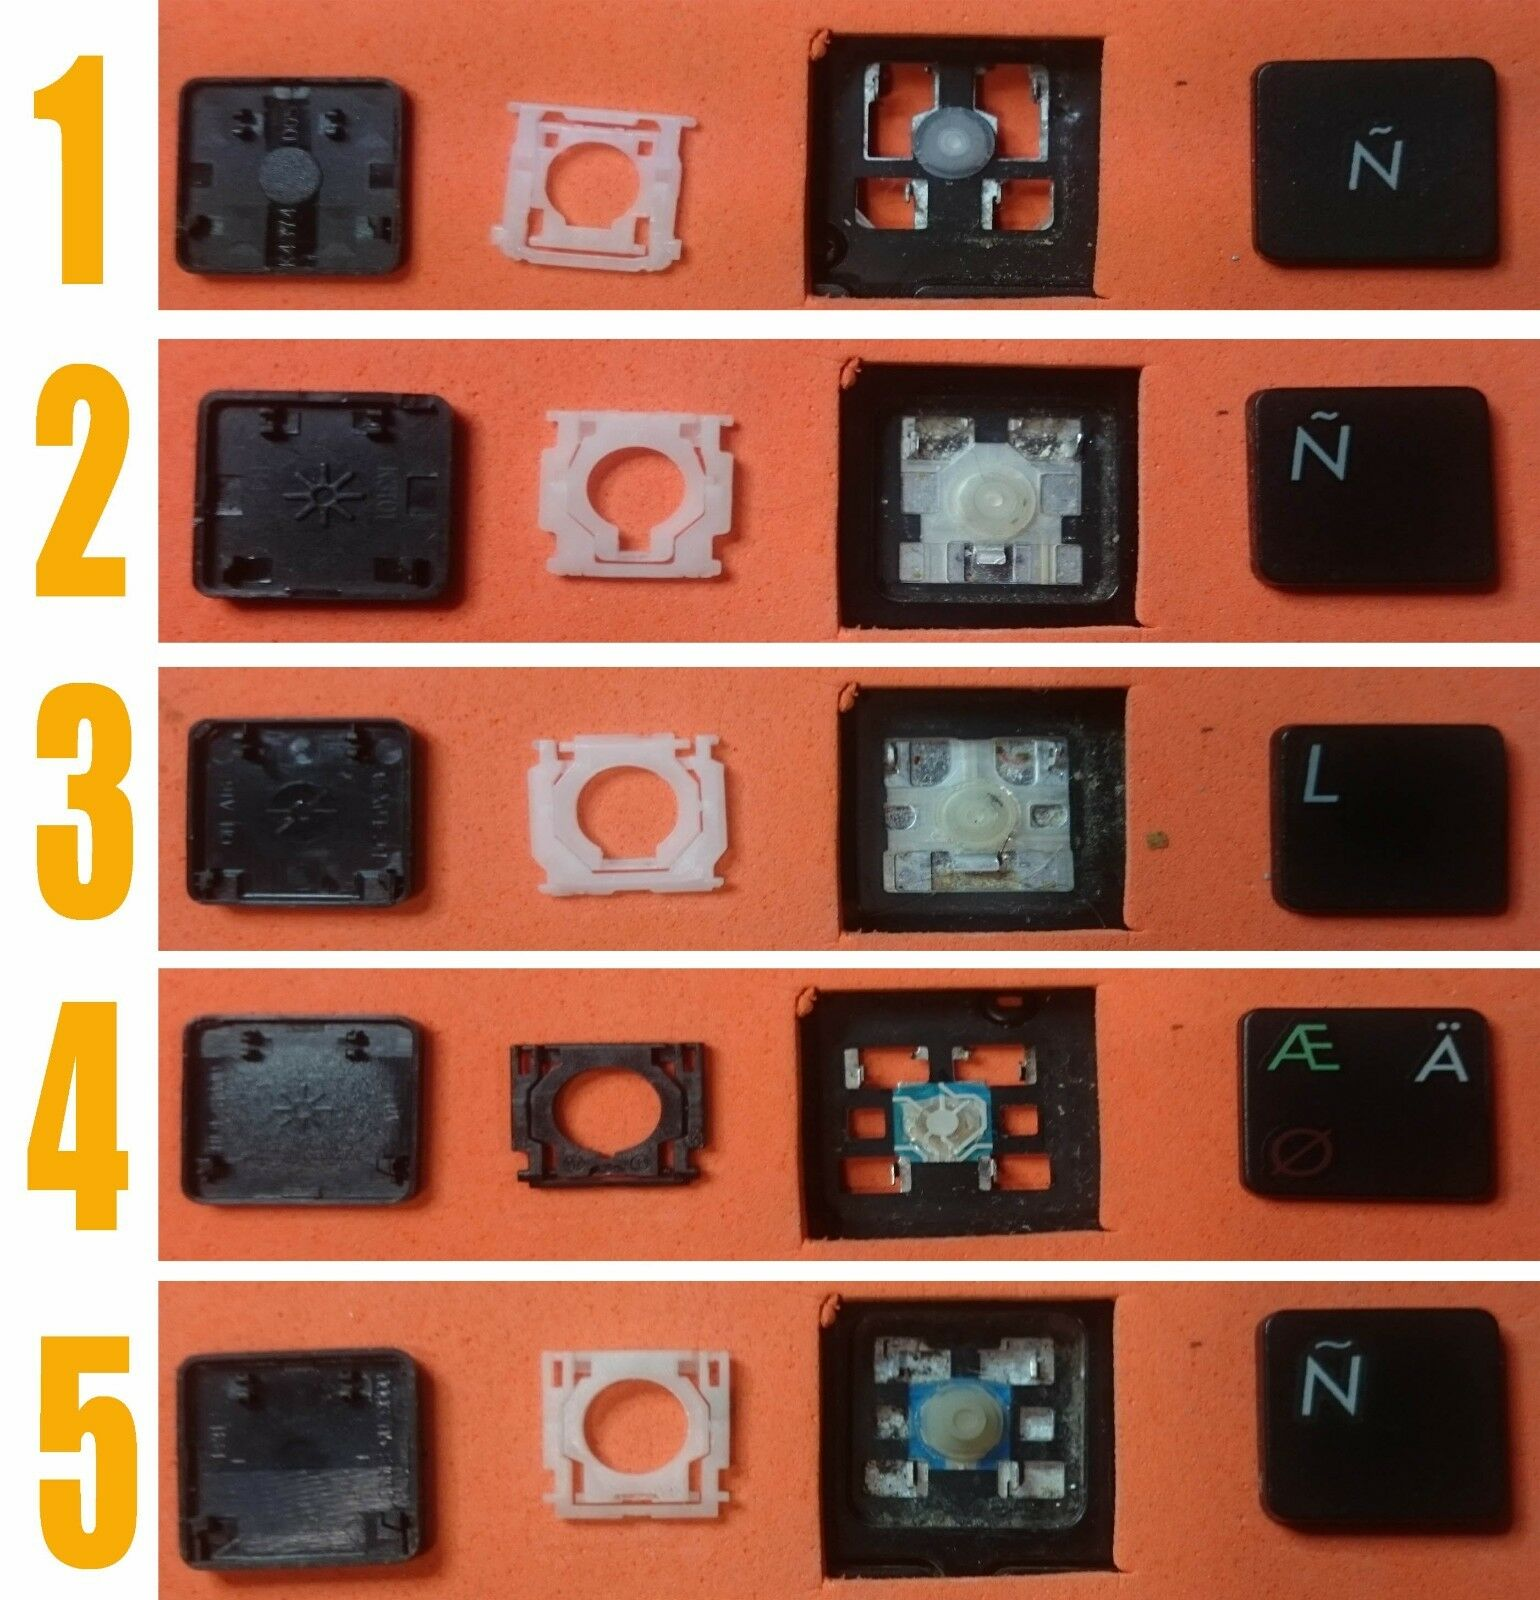 TECLA TECLAS DE TECLADO ASUS N61VN X66 X66IC X66W A43 A43E W90 W90V W90VN W90VP